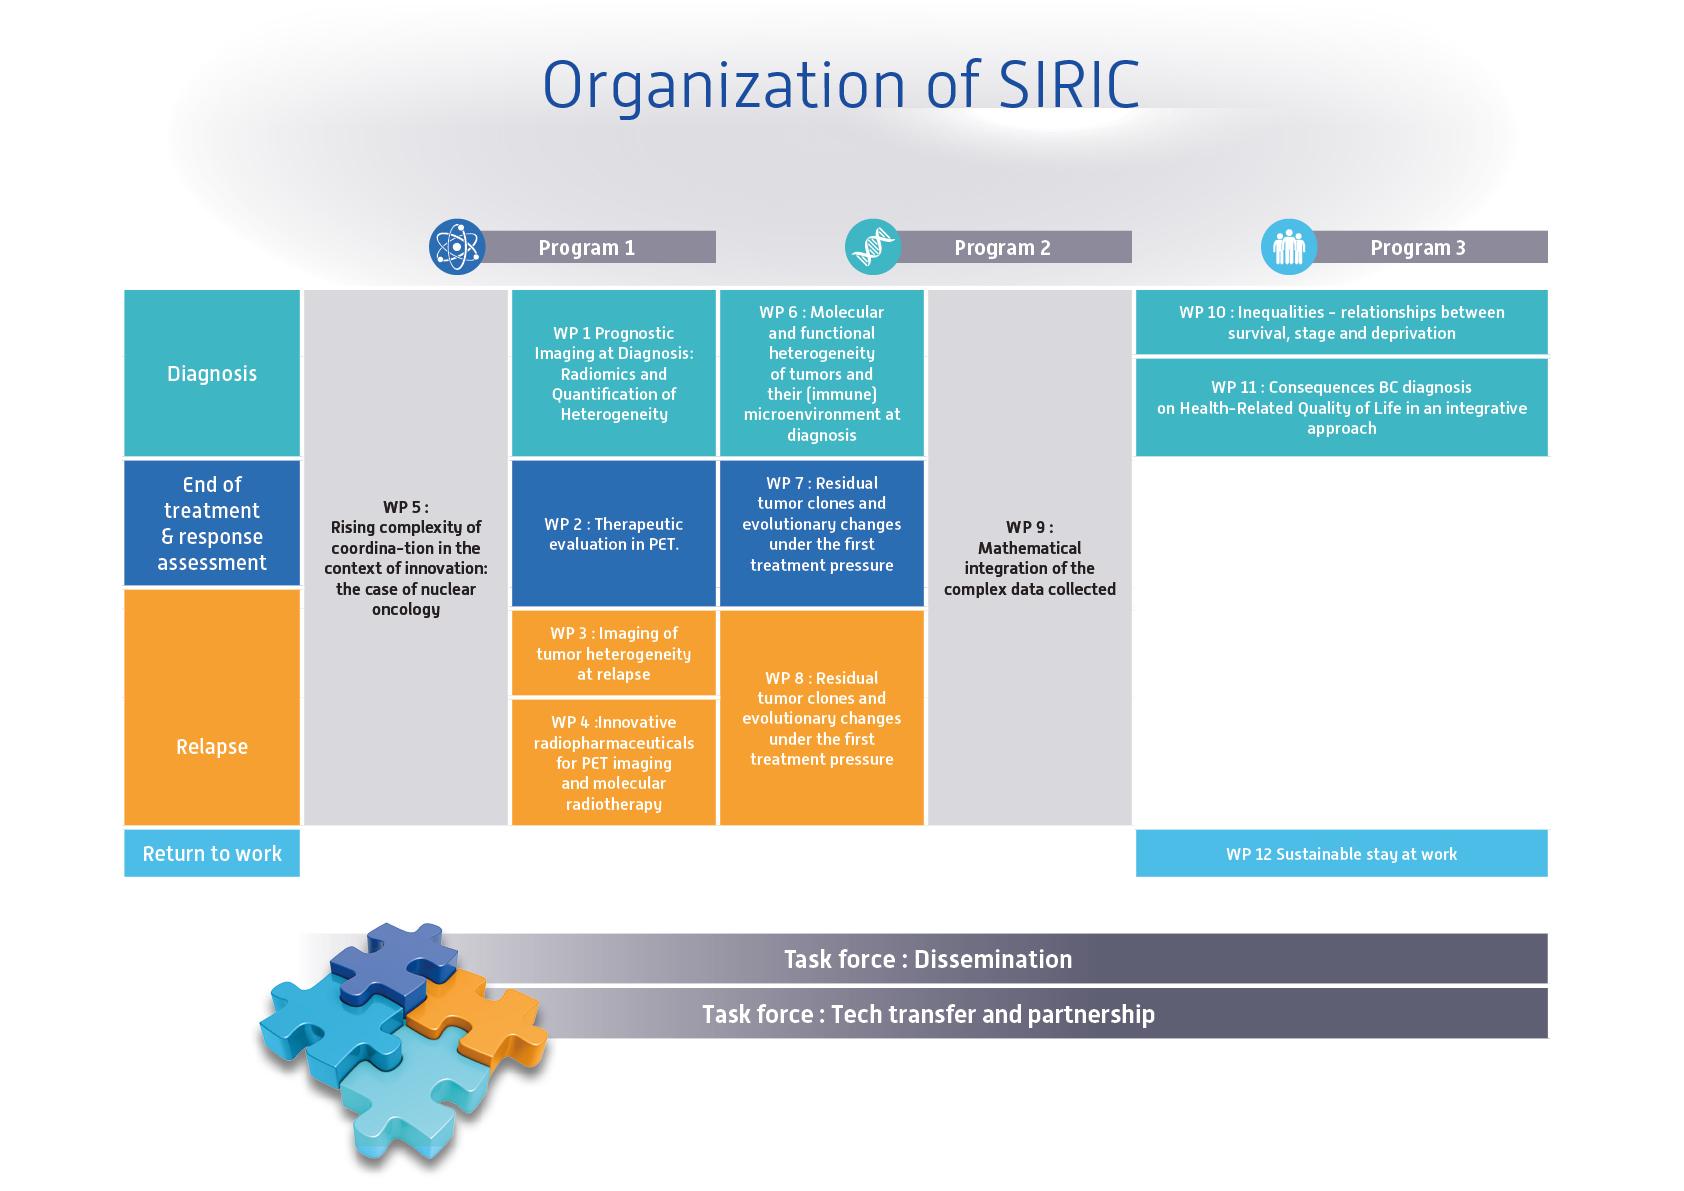 Organization of SIRIC